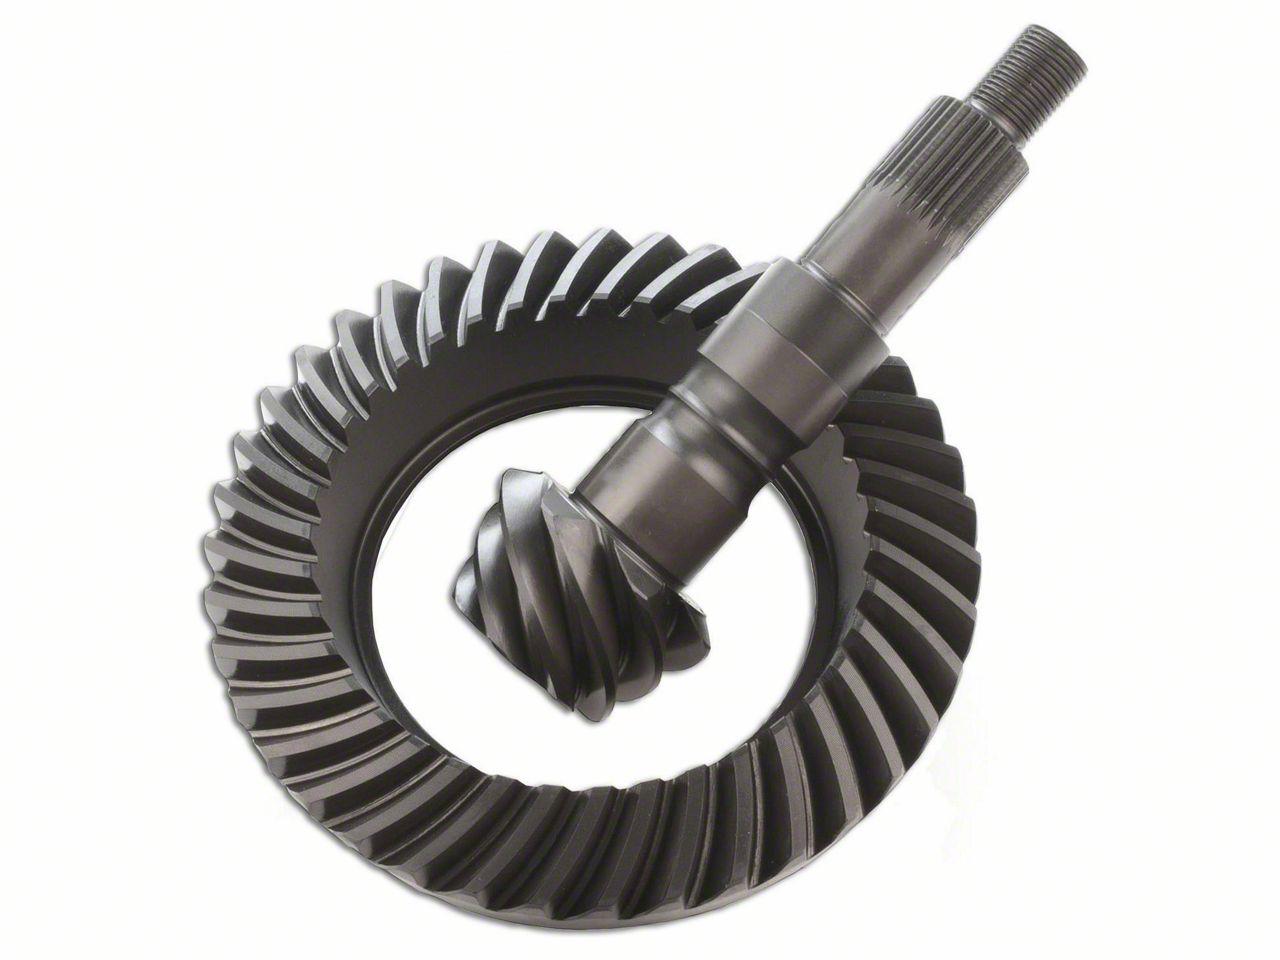 Motive Performance 8.5 in. & 8.6 in. Rear Ring Gear and Pinion Kit - 5.57 Gears (07-18 Sierra 1500)